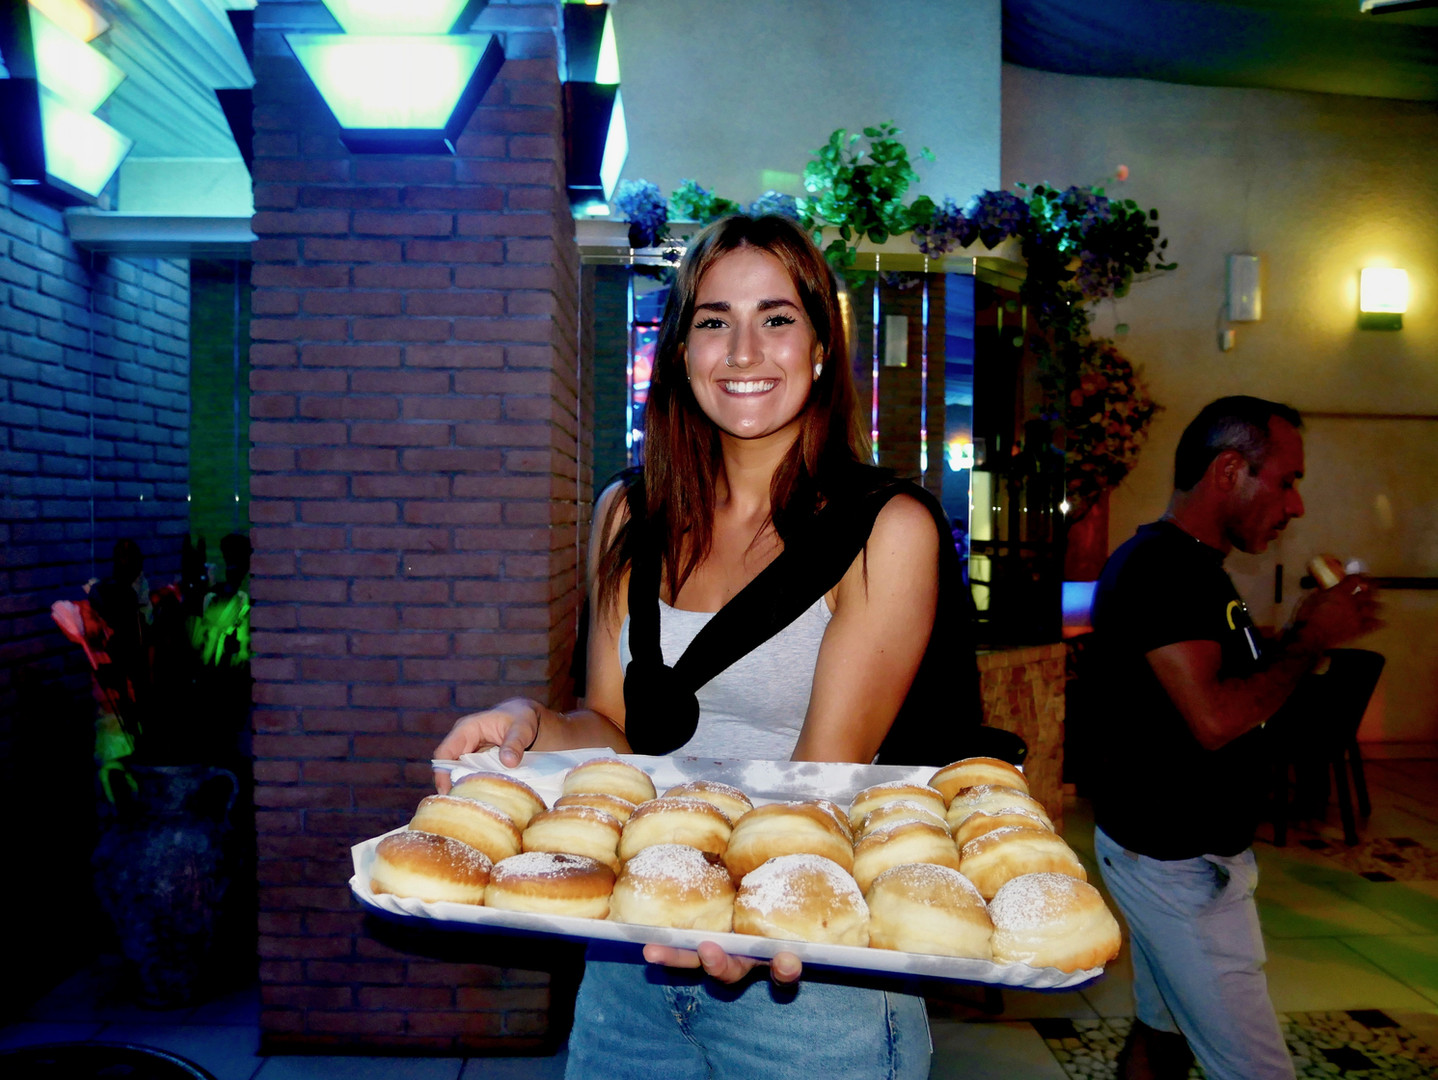 Bomboloni cucina Gobbi Hotels Gatteo Mar